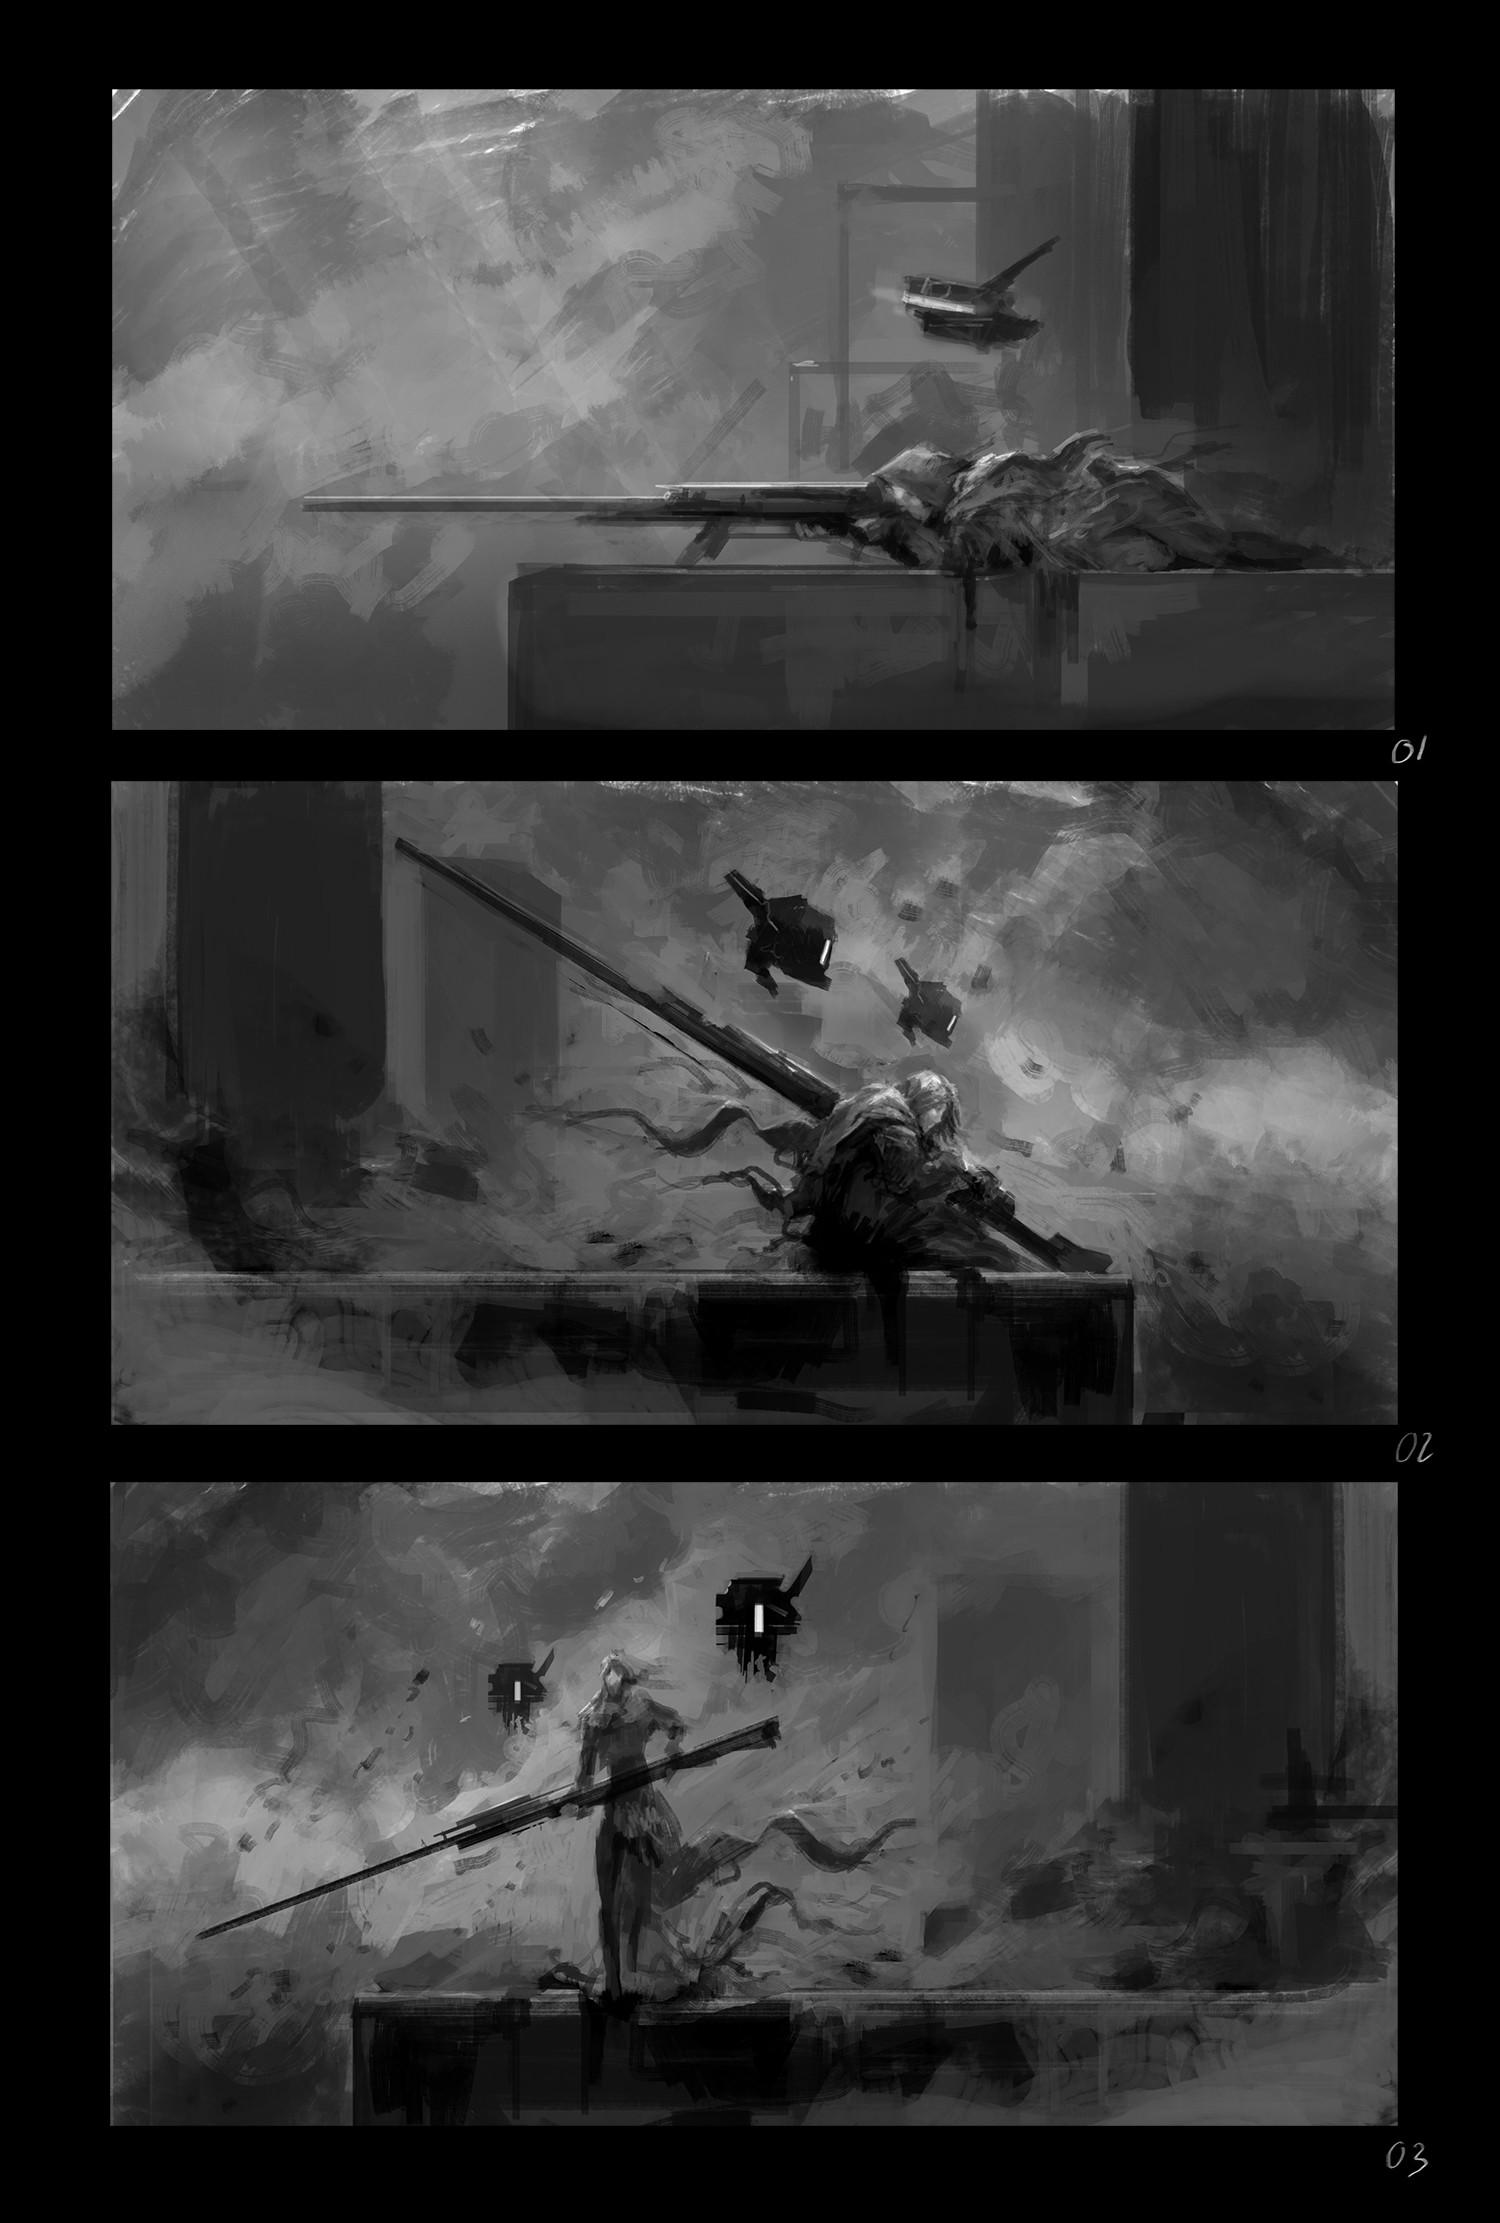 Alexandre chaudret dos prime 01 sketches